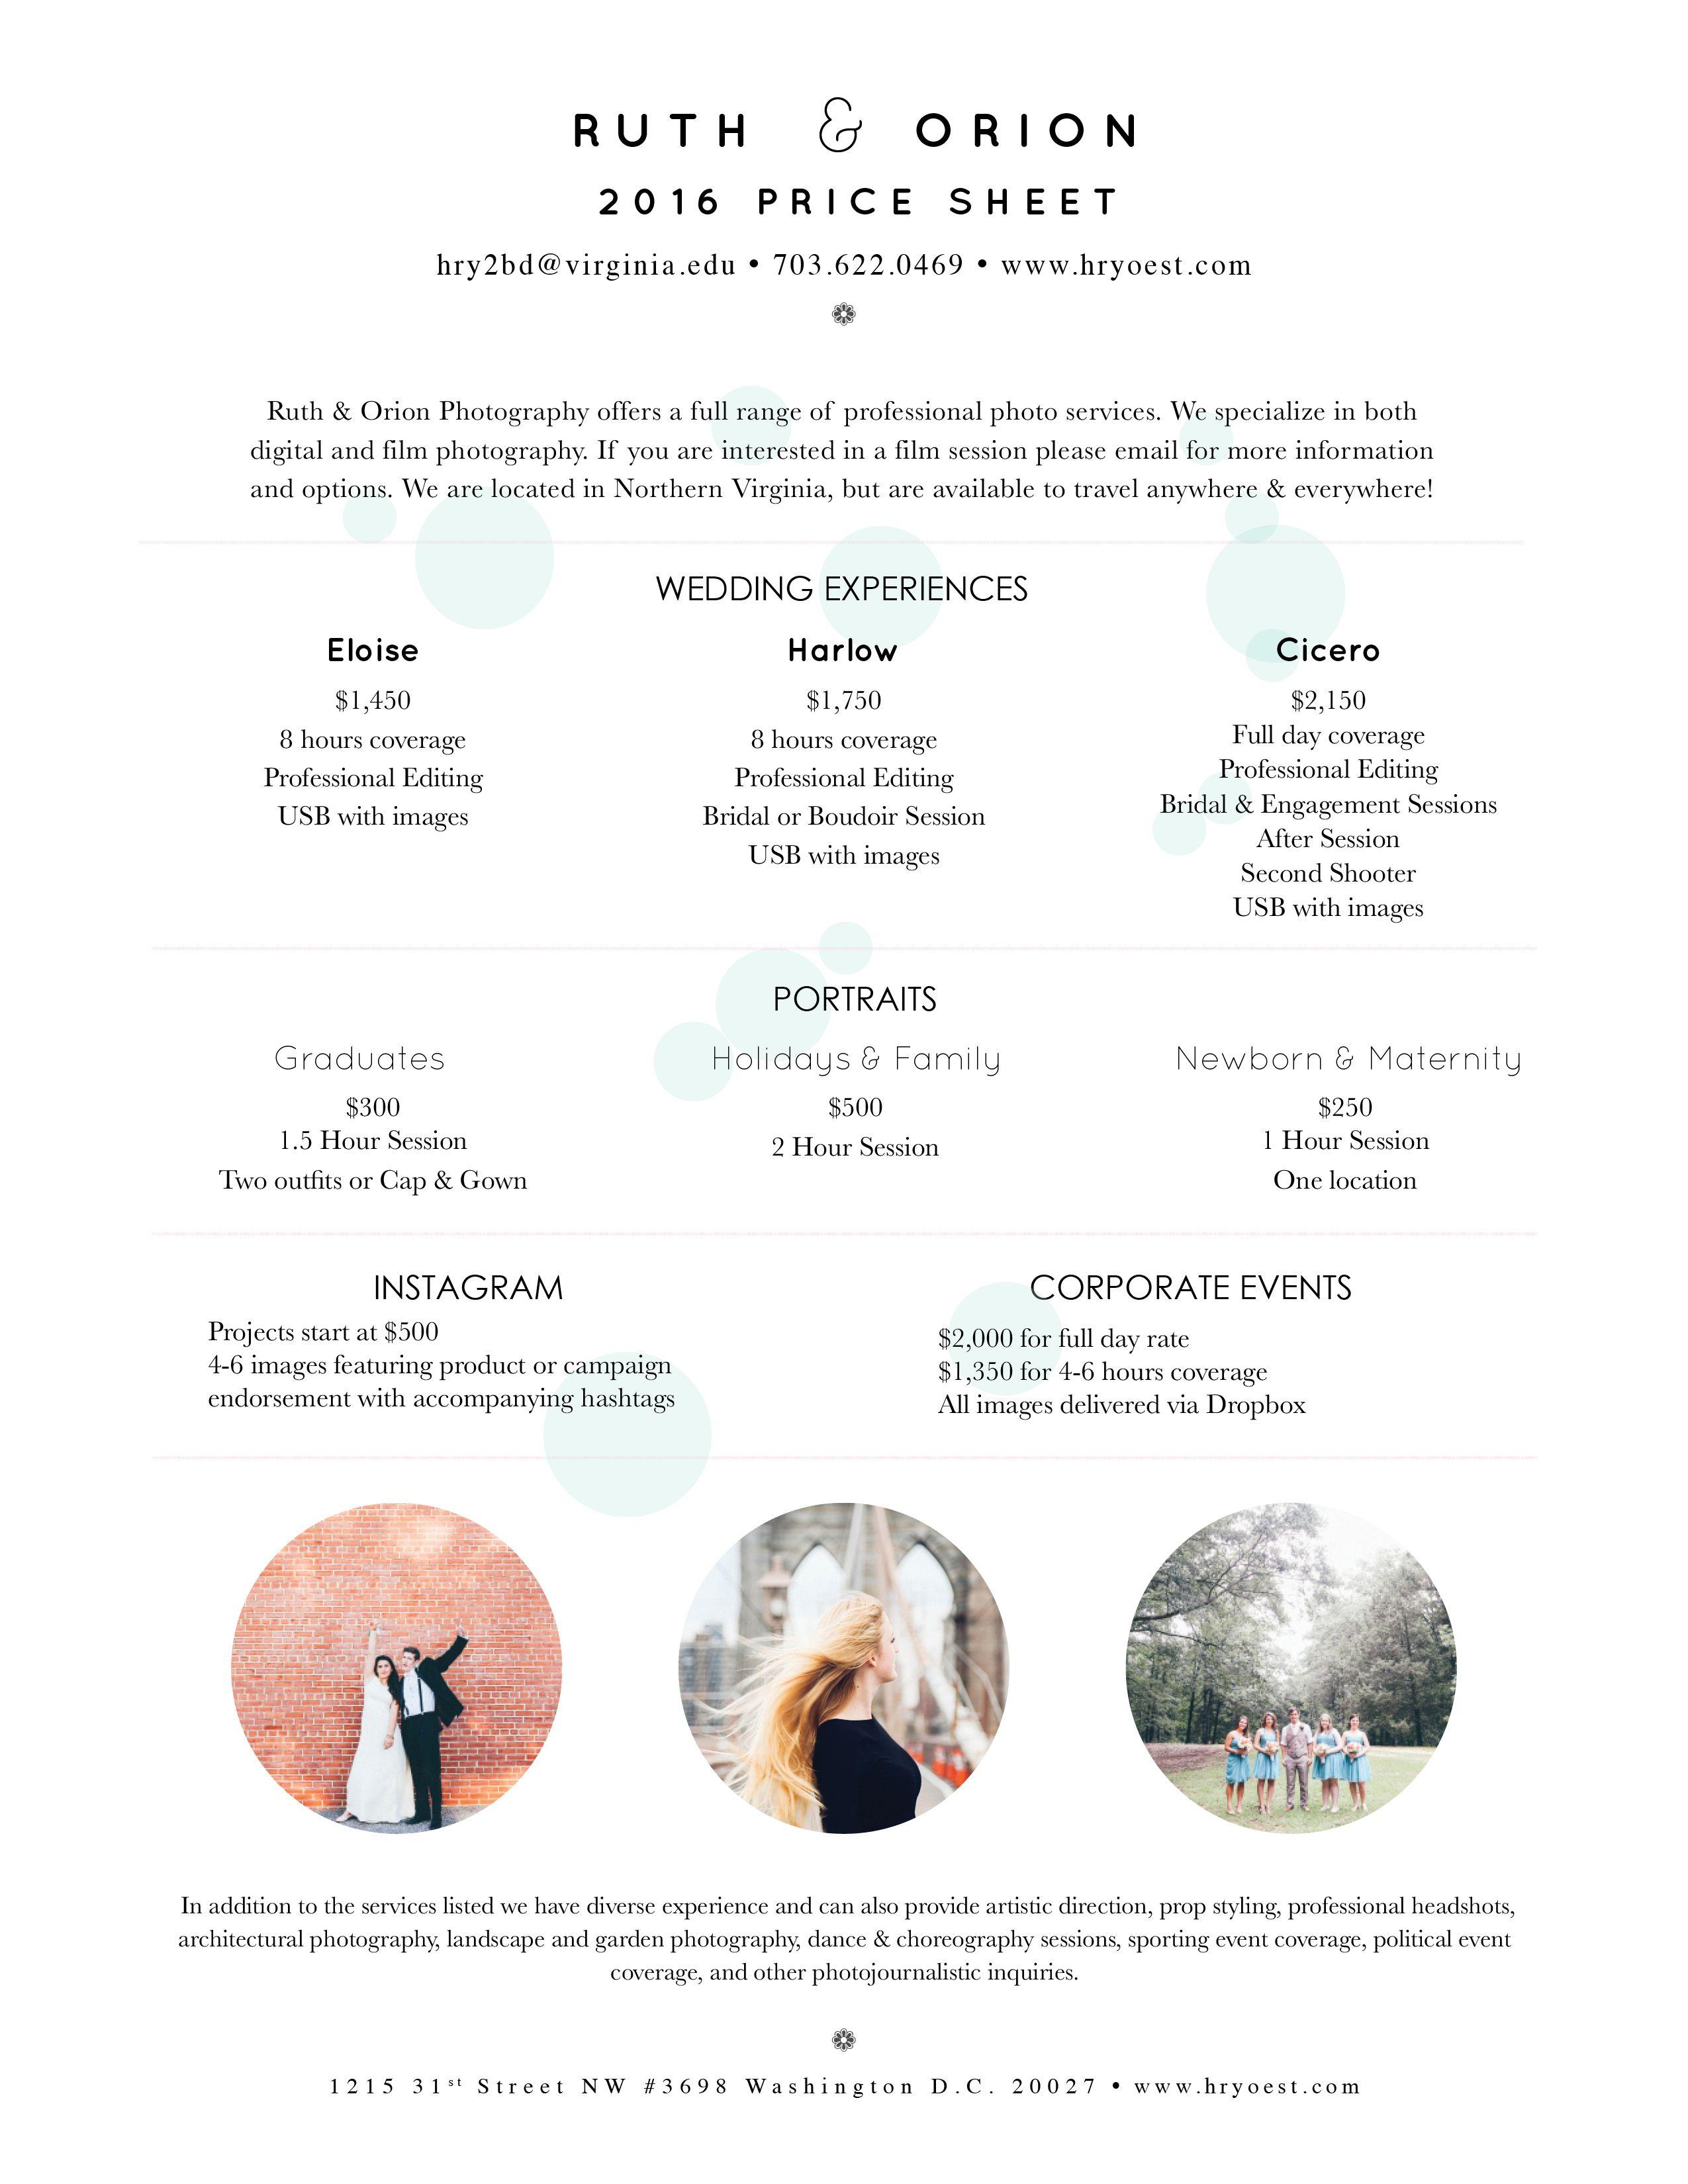 2016 Price Sheet! www.hryoest.com #weddingphotography #pricesheet #photography #weddings #portraitphotography #design #graphic #wedding #portraiture #photographer #lifestyle #boudoir #graduation